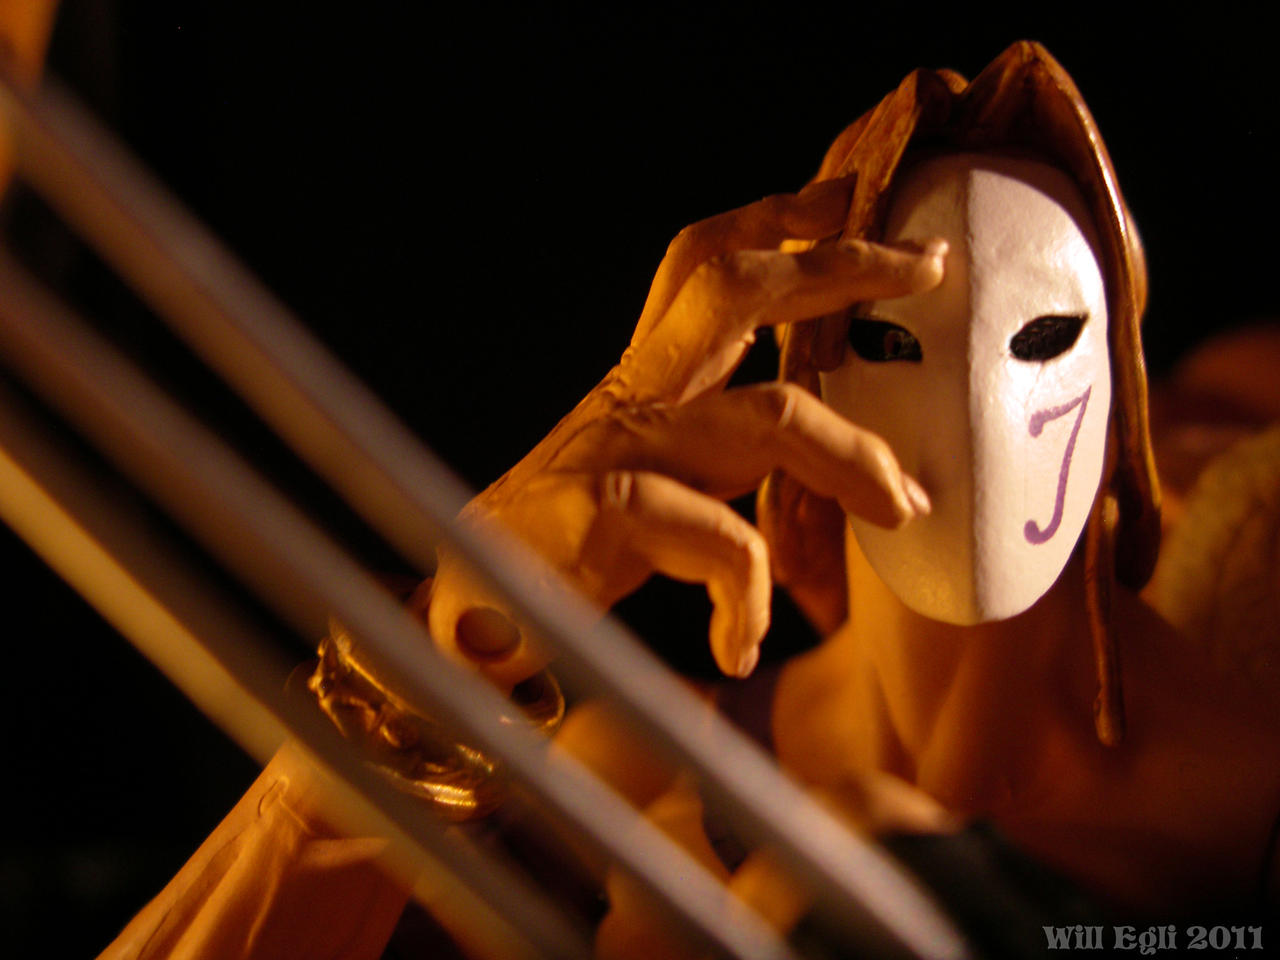 Vega's mask - Mind reading by SurfTiki